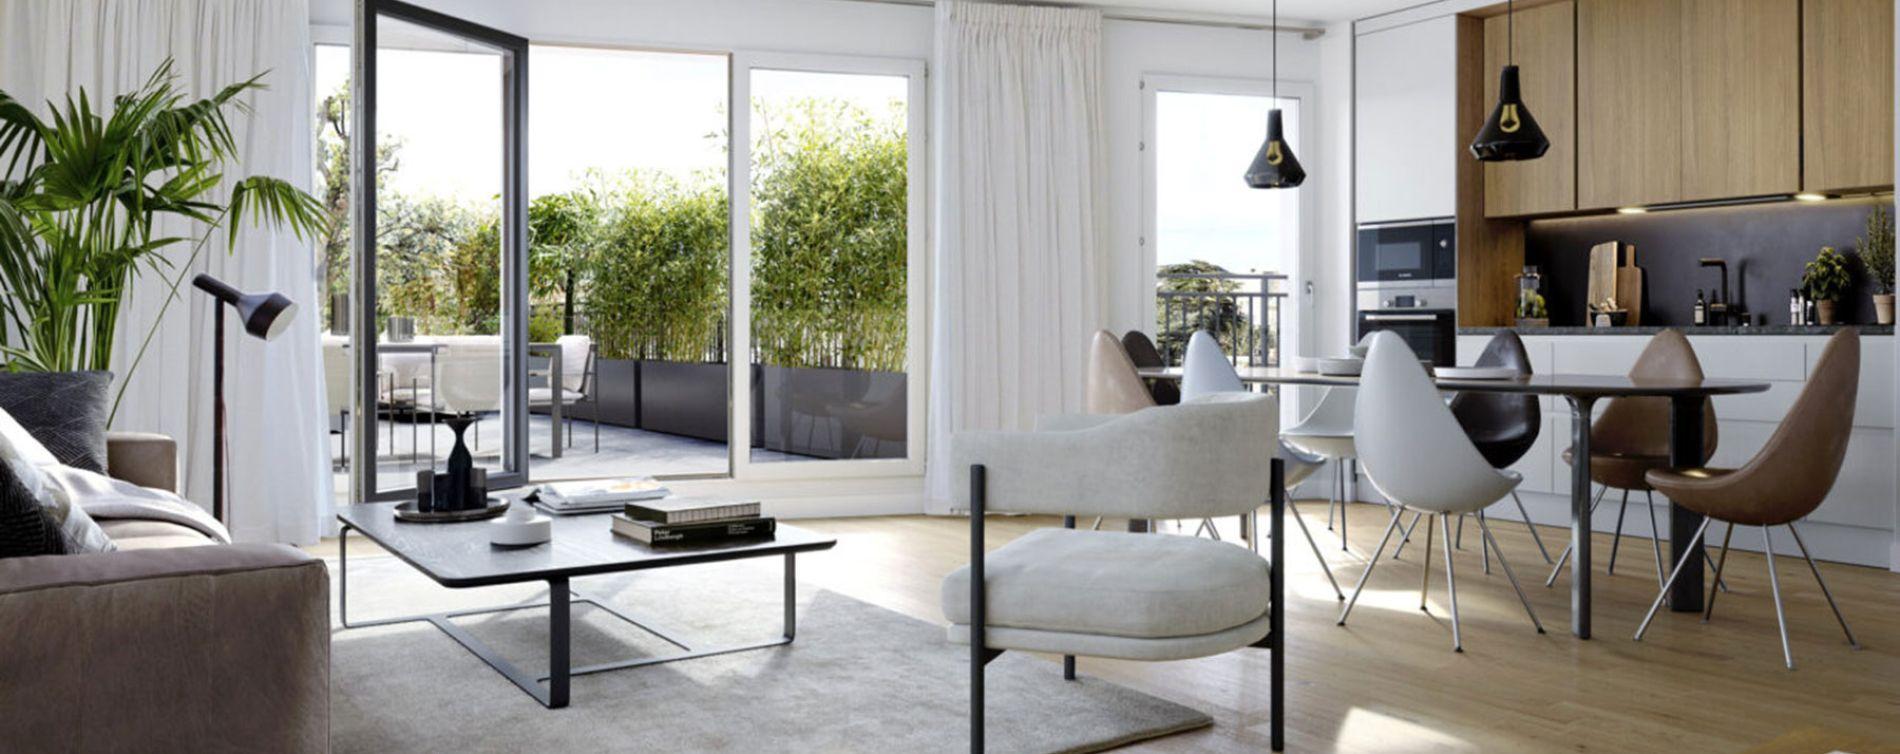 Le Blanc-Mesnil : programme immobilier neuve « Programme immobilier n°219042 » en Loi Pinel (5)